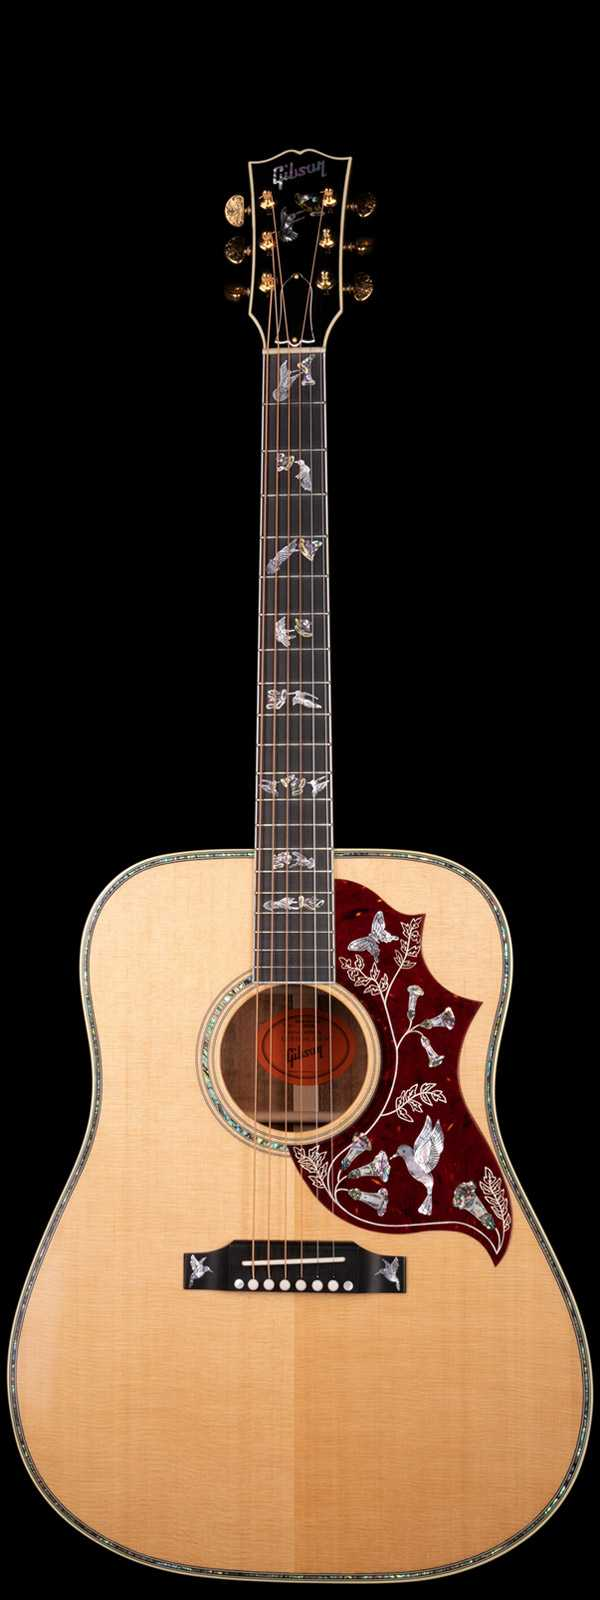 Gibson Custom Shop Hummingbird Custom Koa Antique Natural